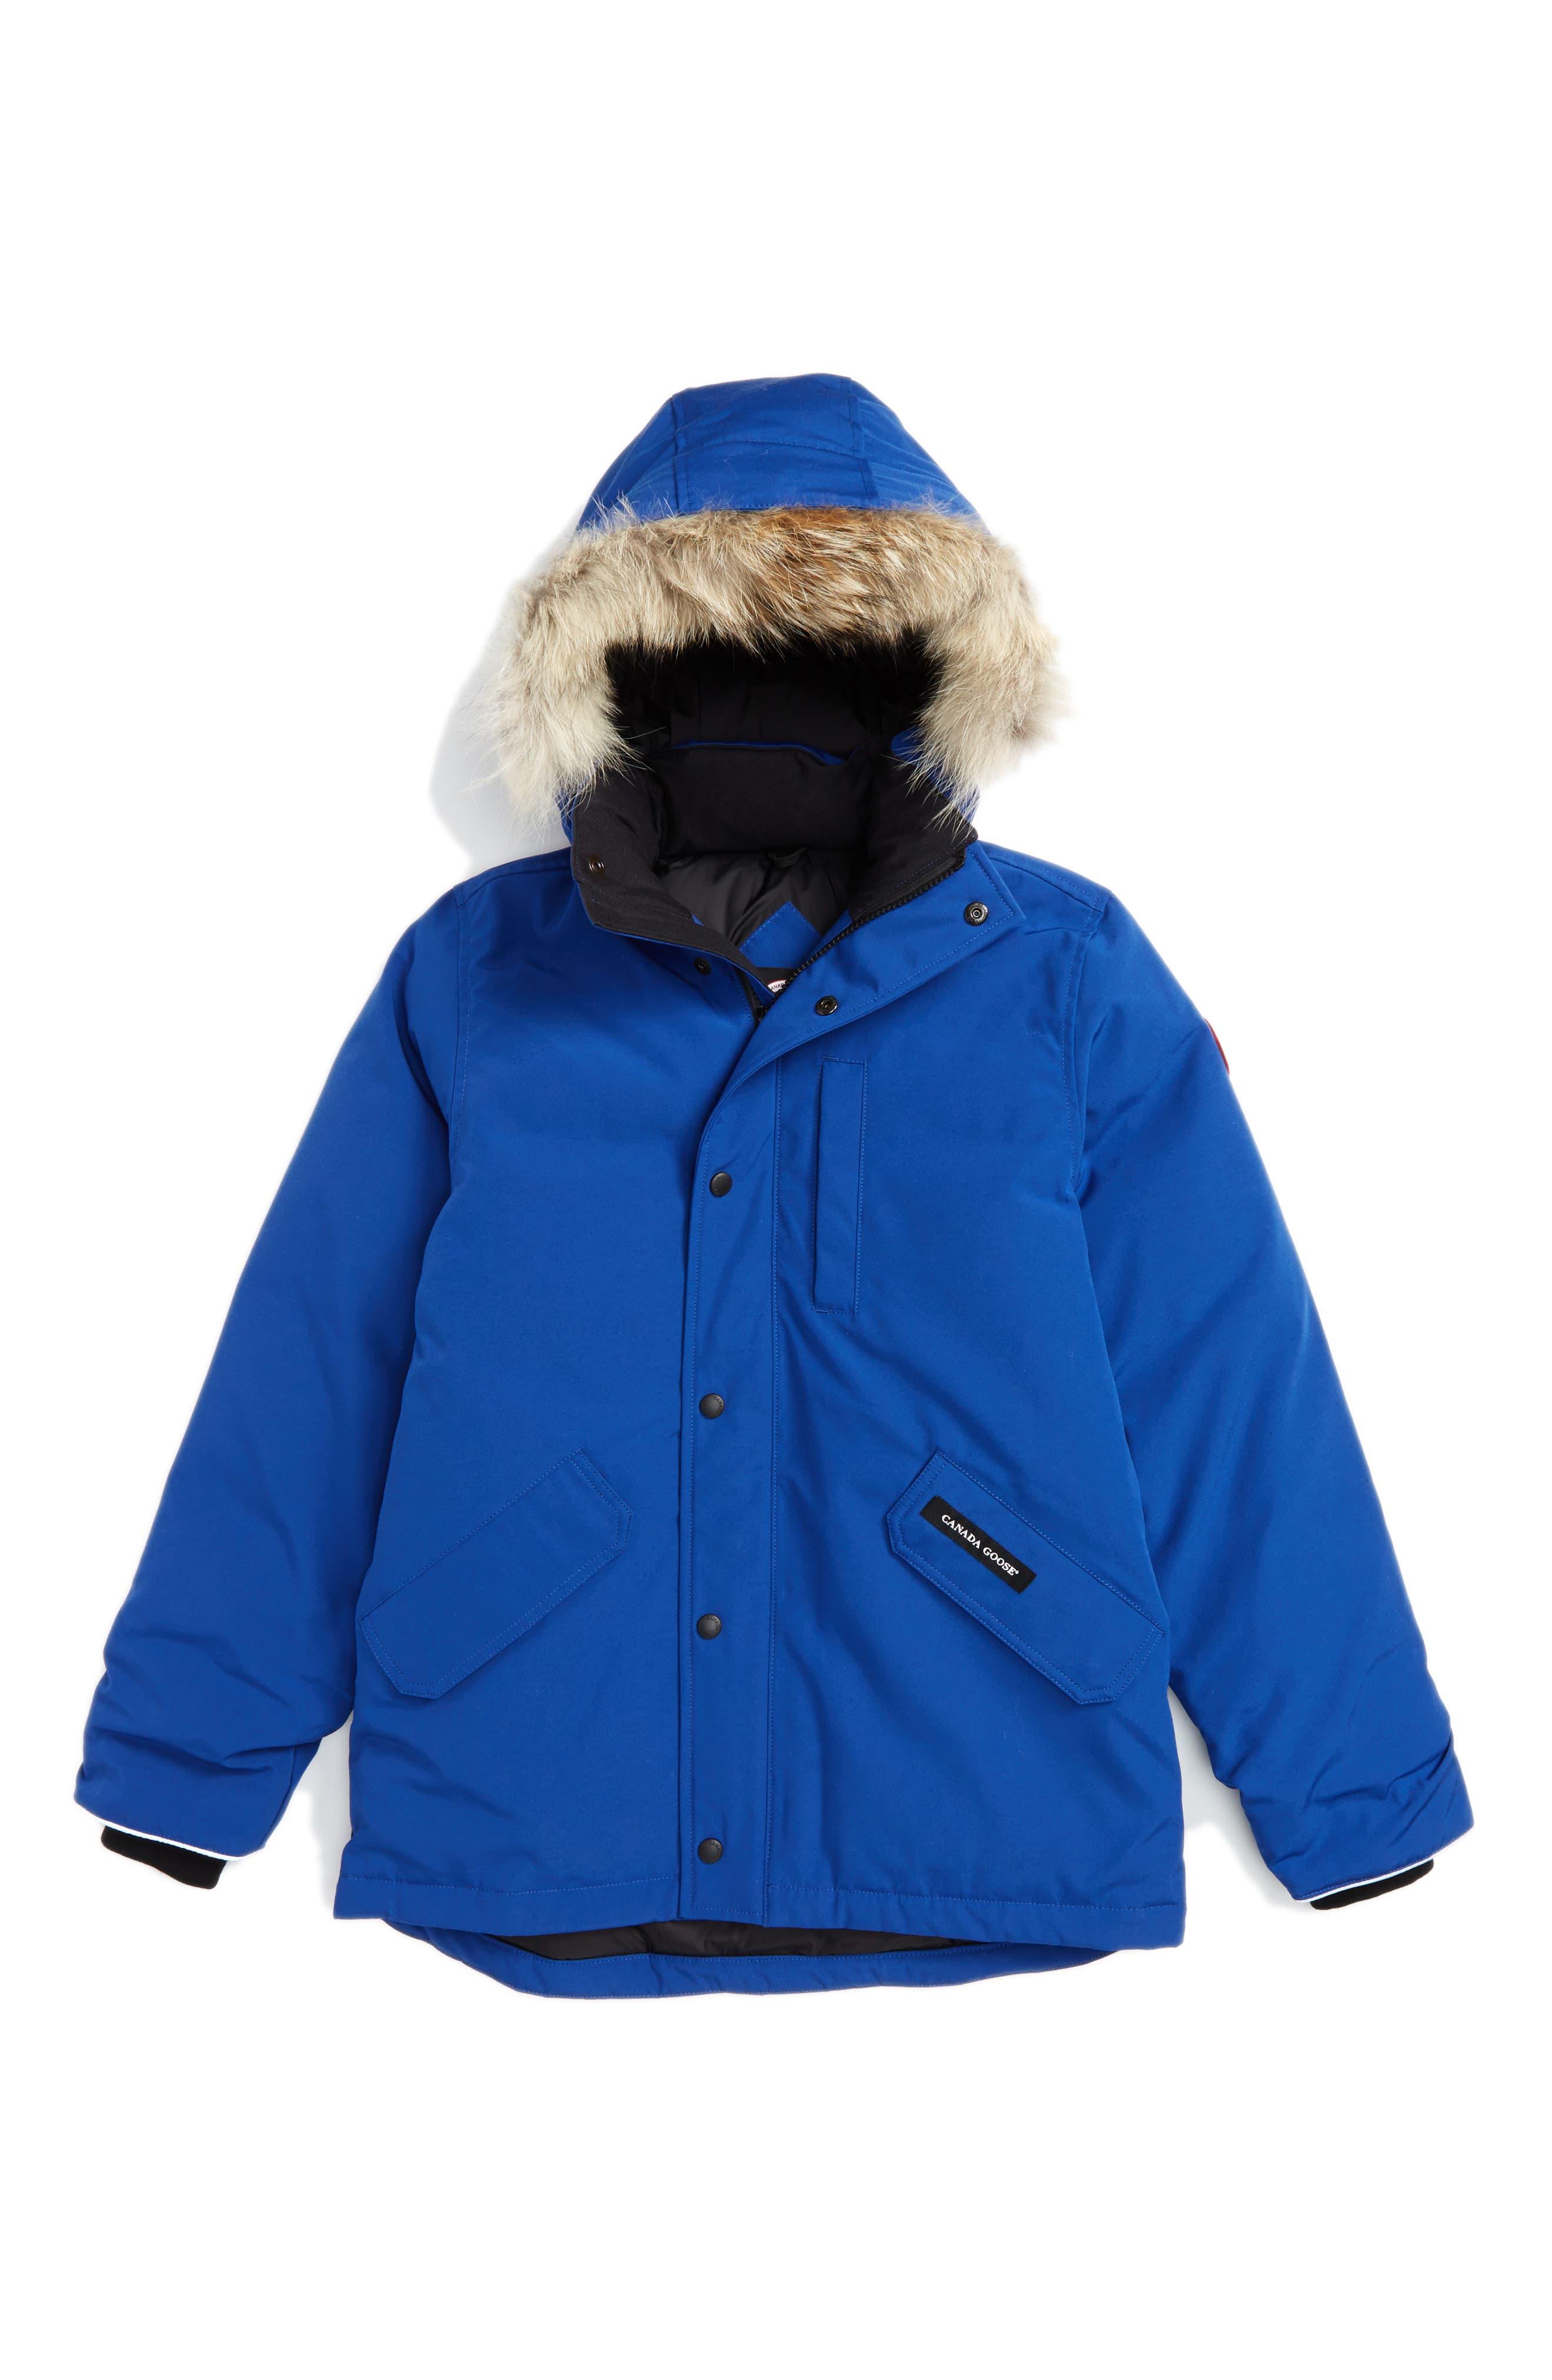 Canada Goose 'Logan' Down Parka with Genuine Coyote Fur Trim (Little Kid & Big Kid)